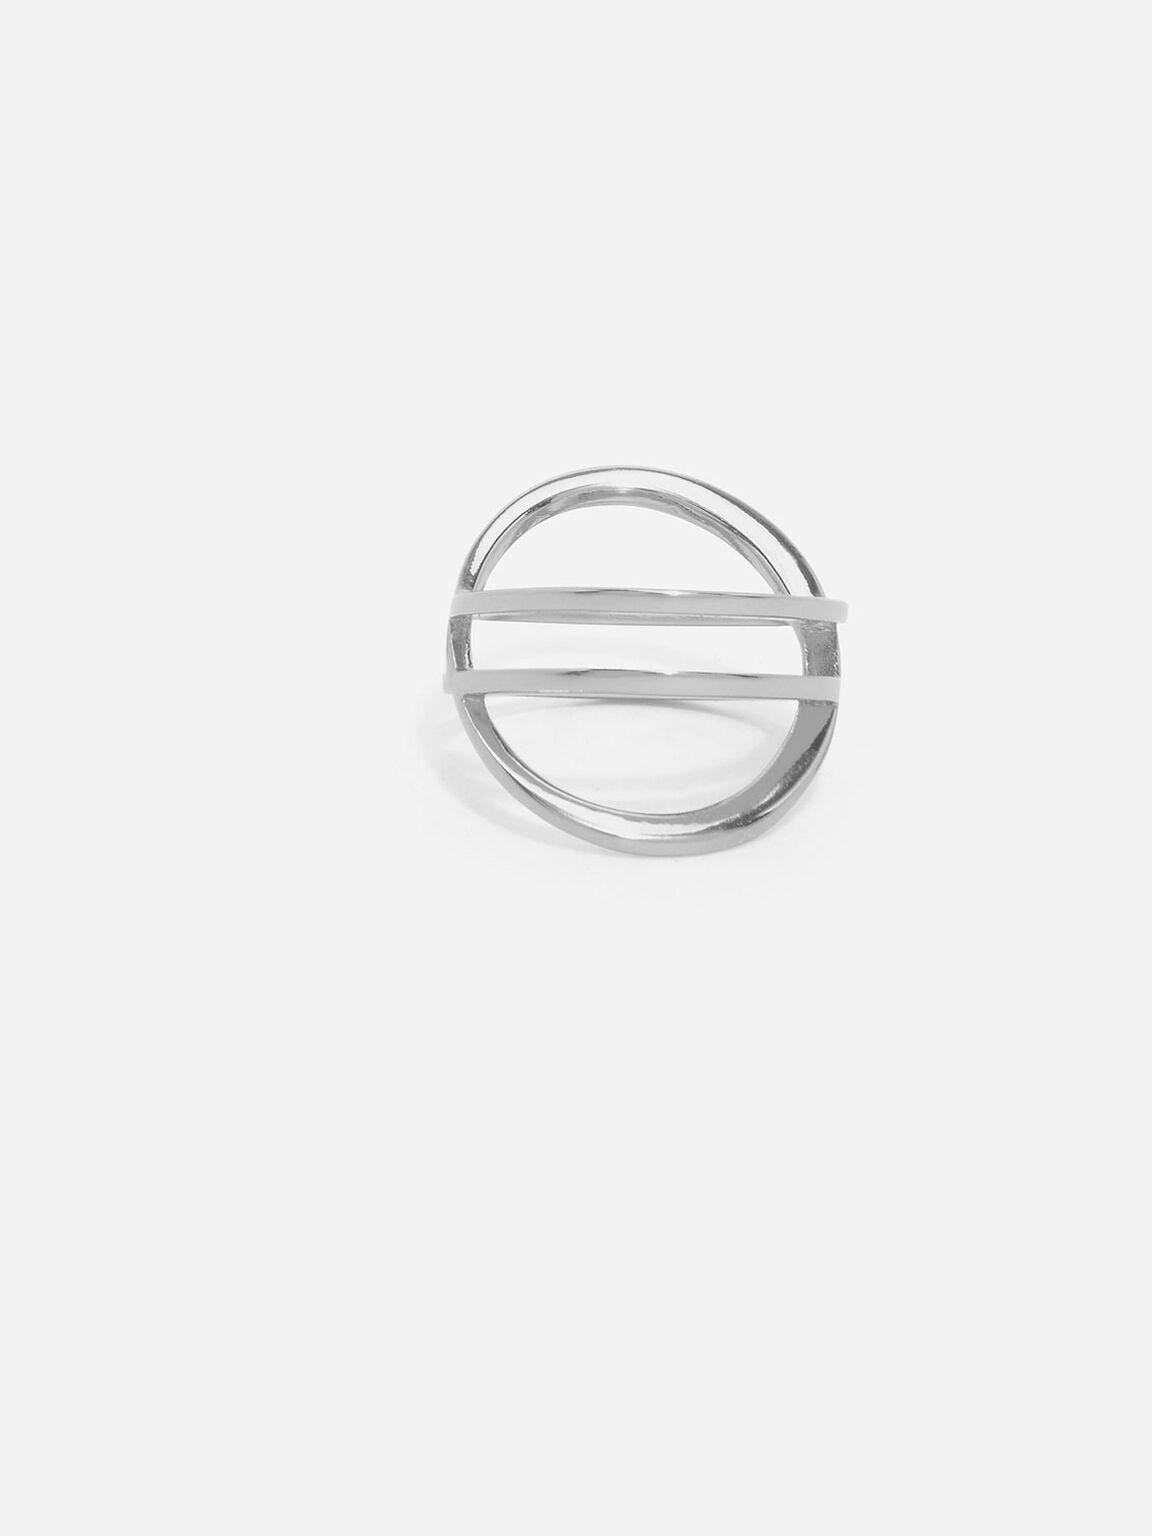 Criss Cross Ring, Silver, hi-res